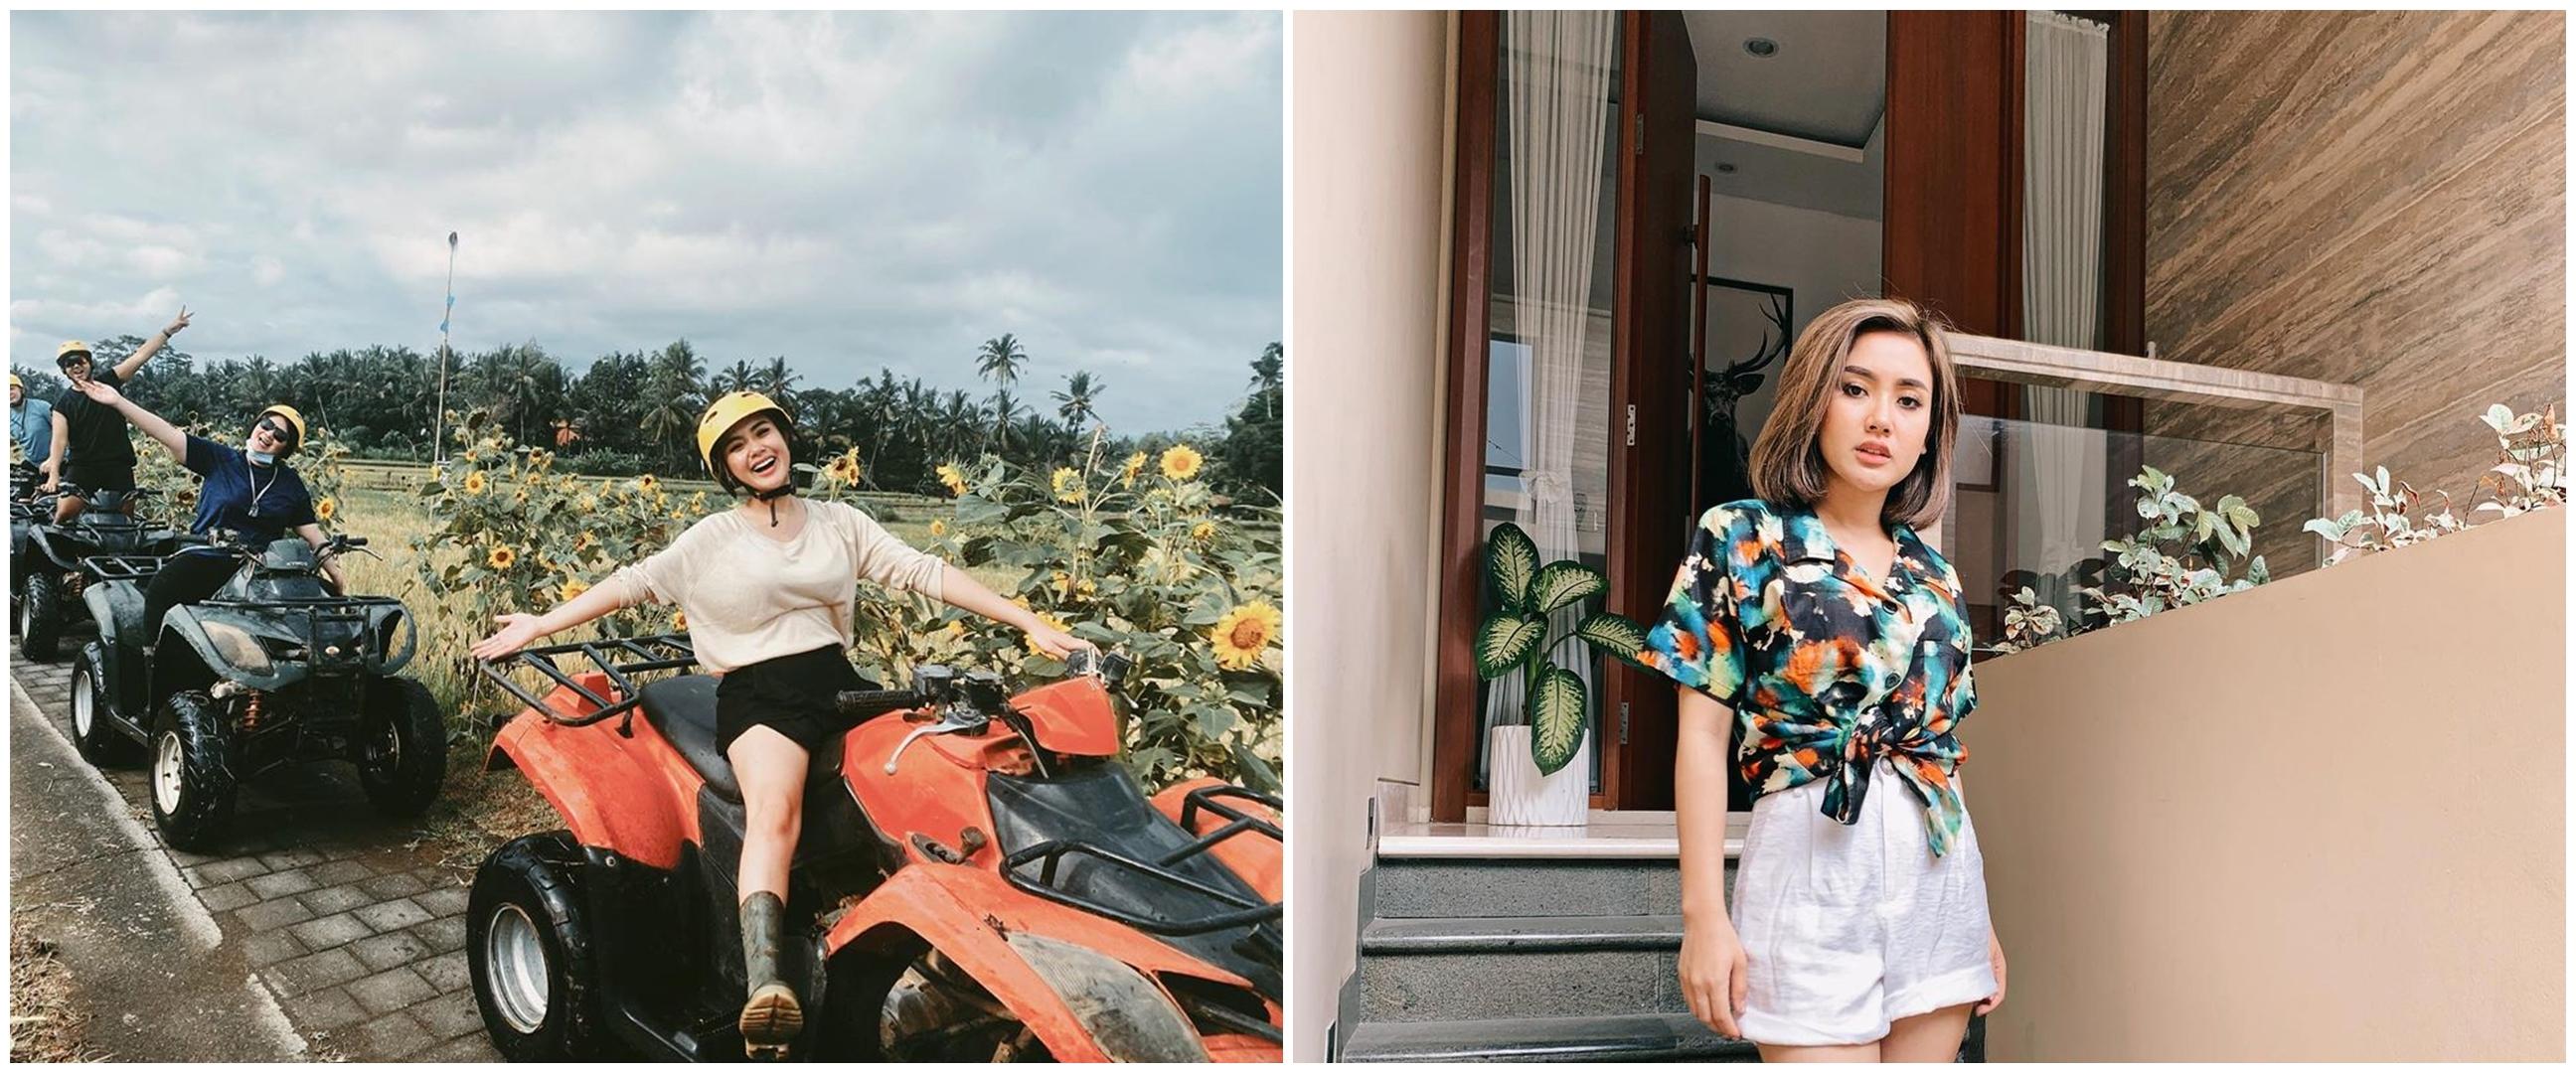 10 Momen seru Cita Citata liburan di Bali, main ATV rame-rame